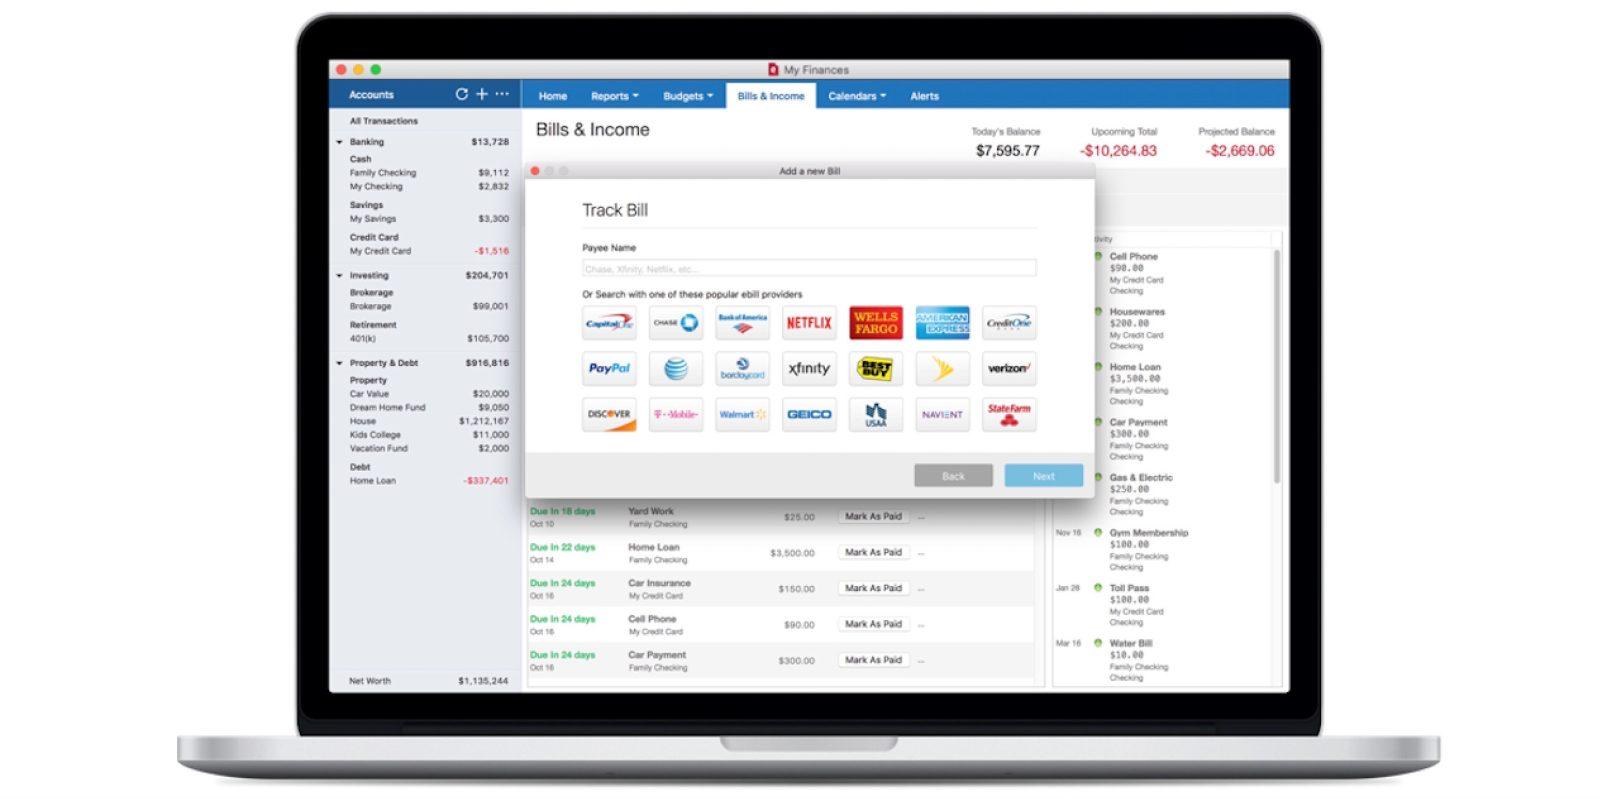 Quicken 2018 offers three Mac subscription plans w/ online